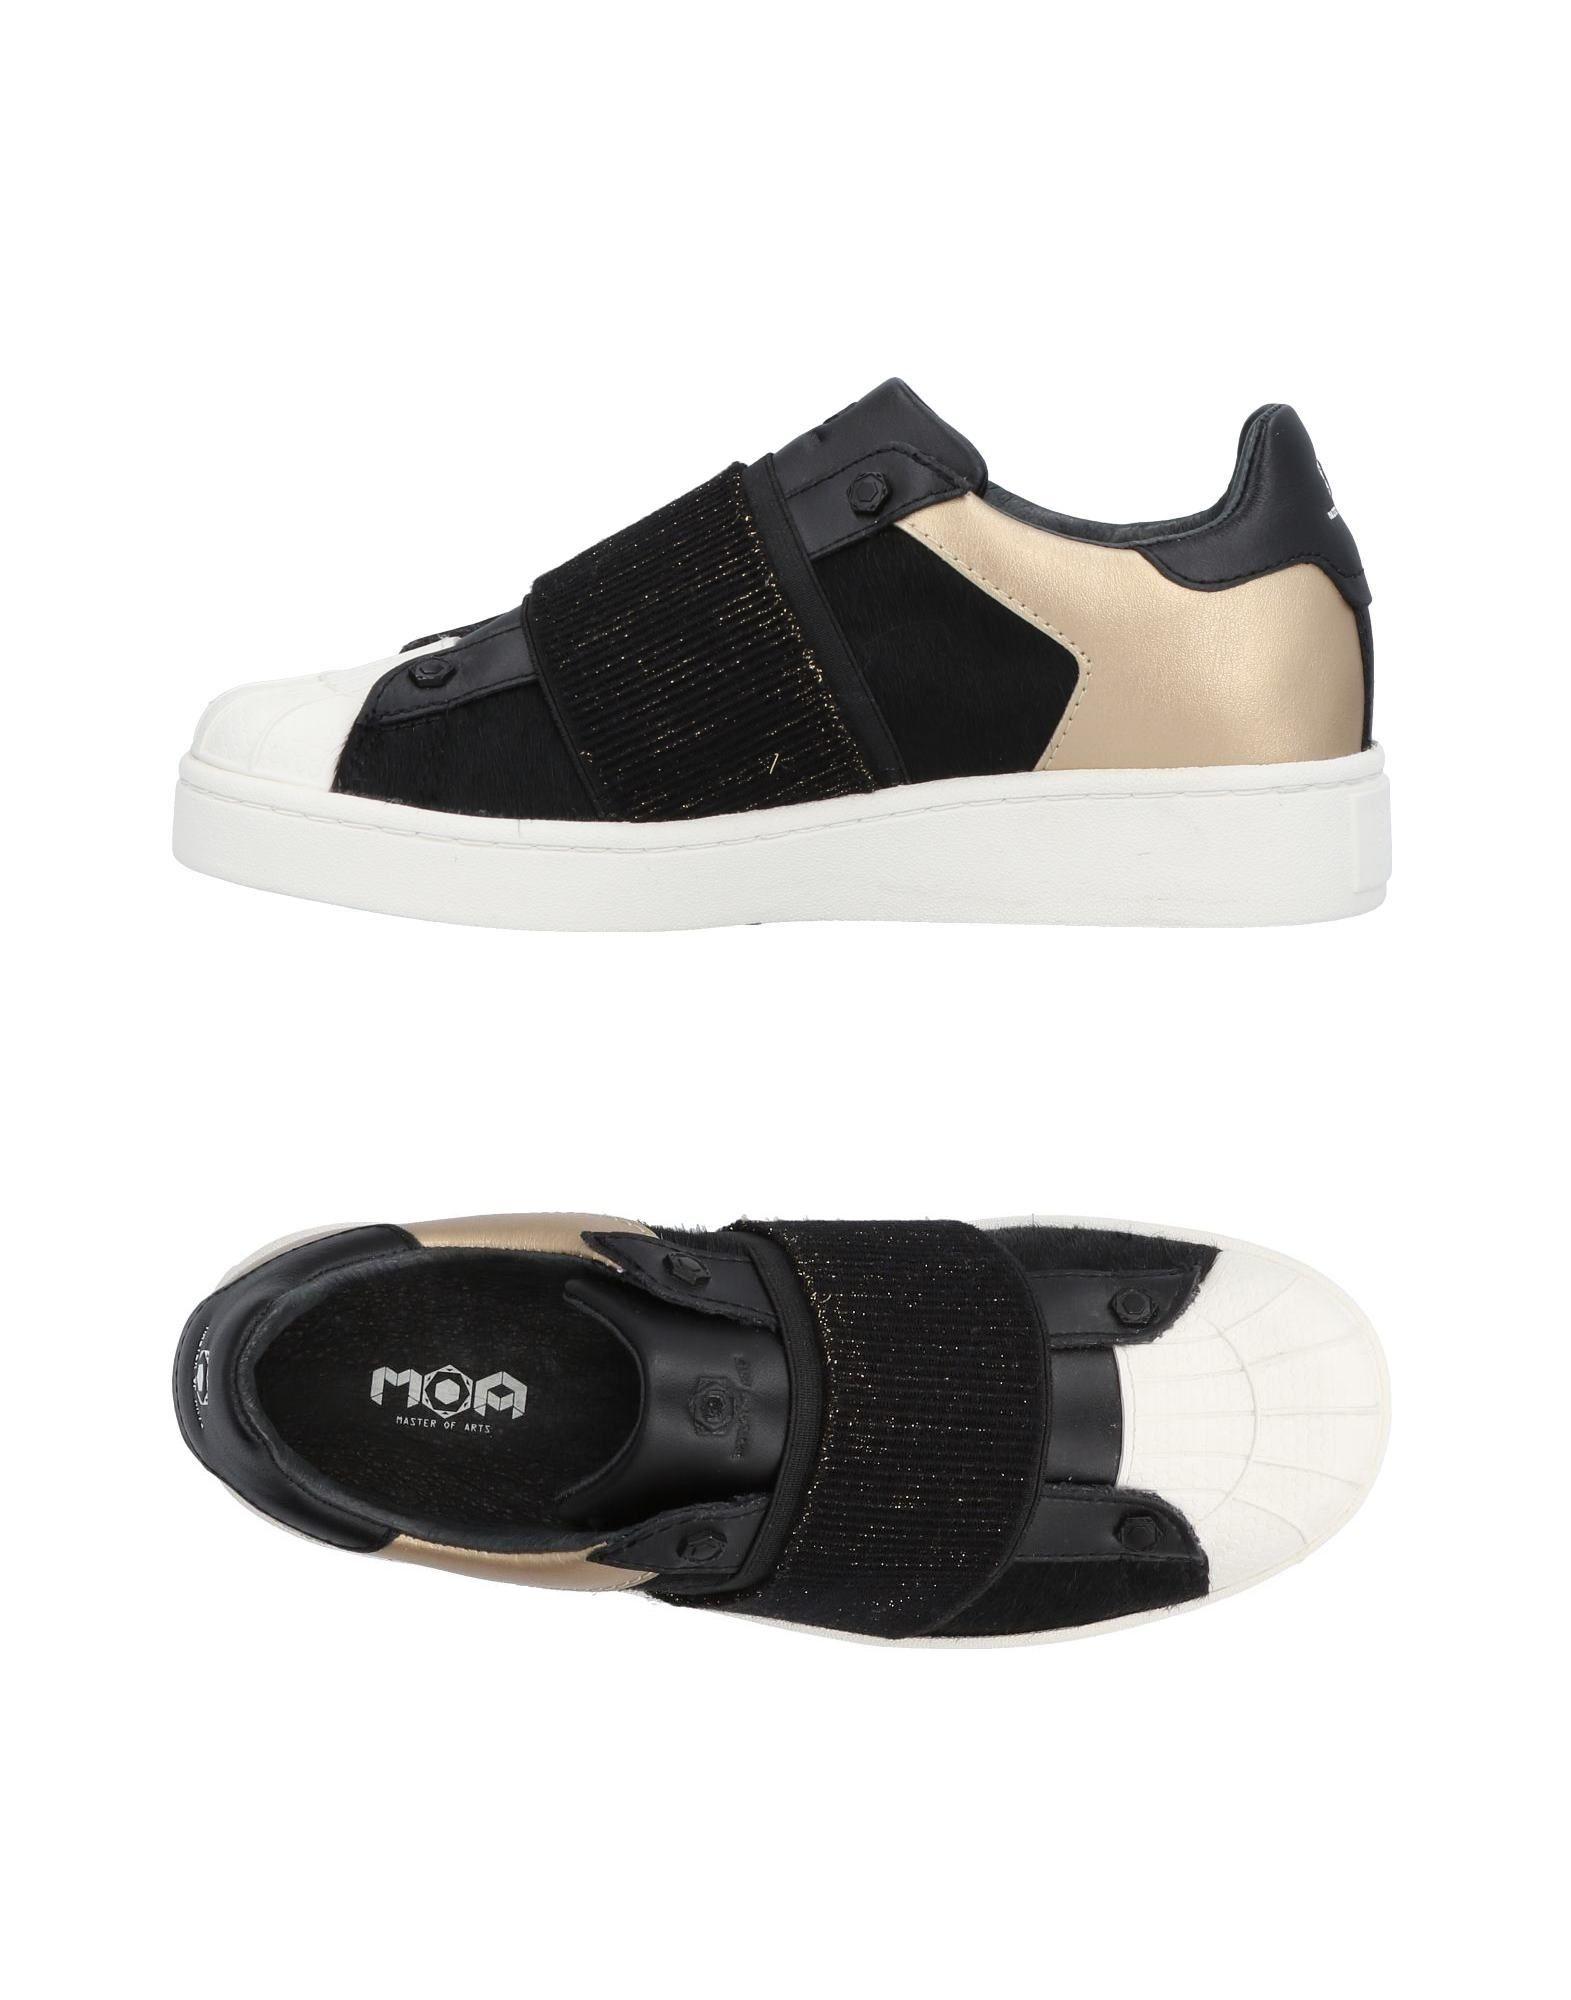 Stilvolle billige Schuhe Moa Master Of 11470040QG Arts Sneakers Damen  11470040QG Of fb779e